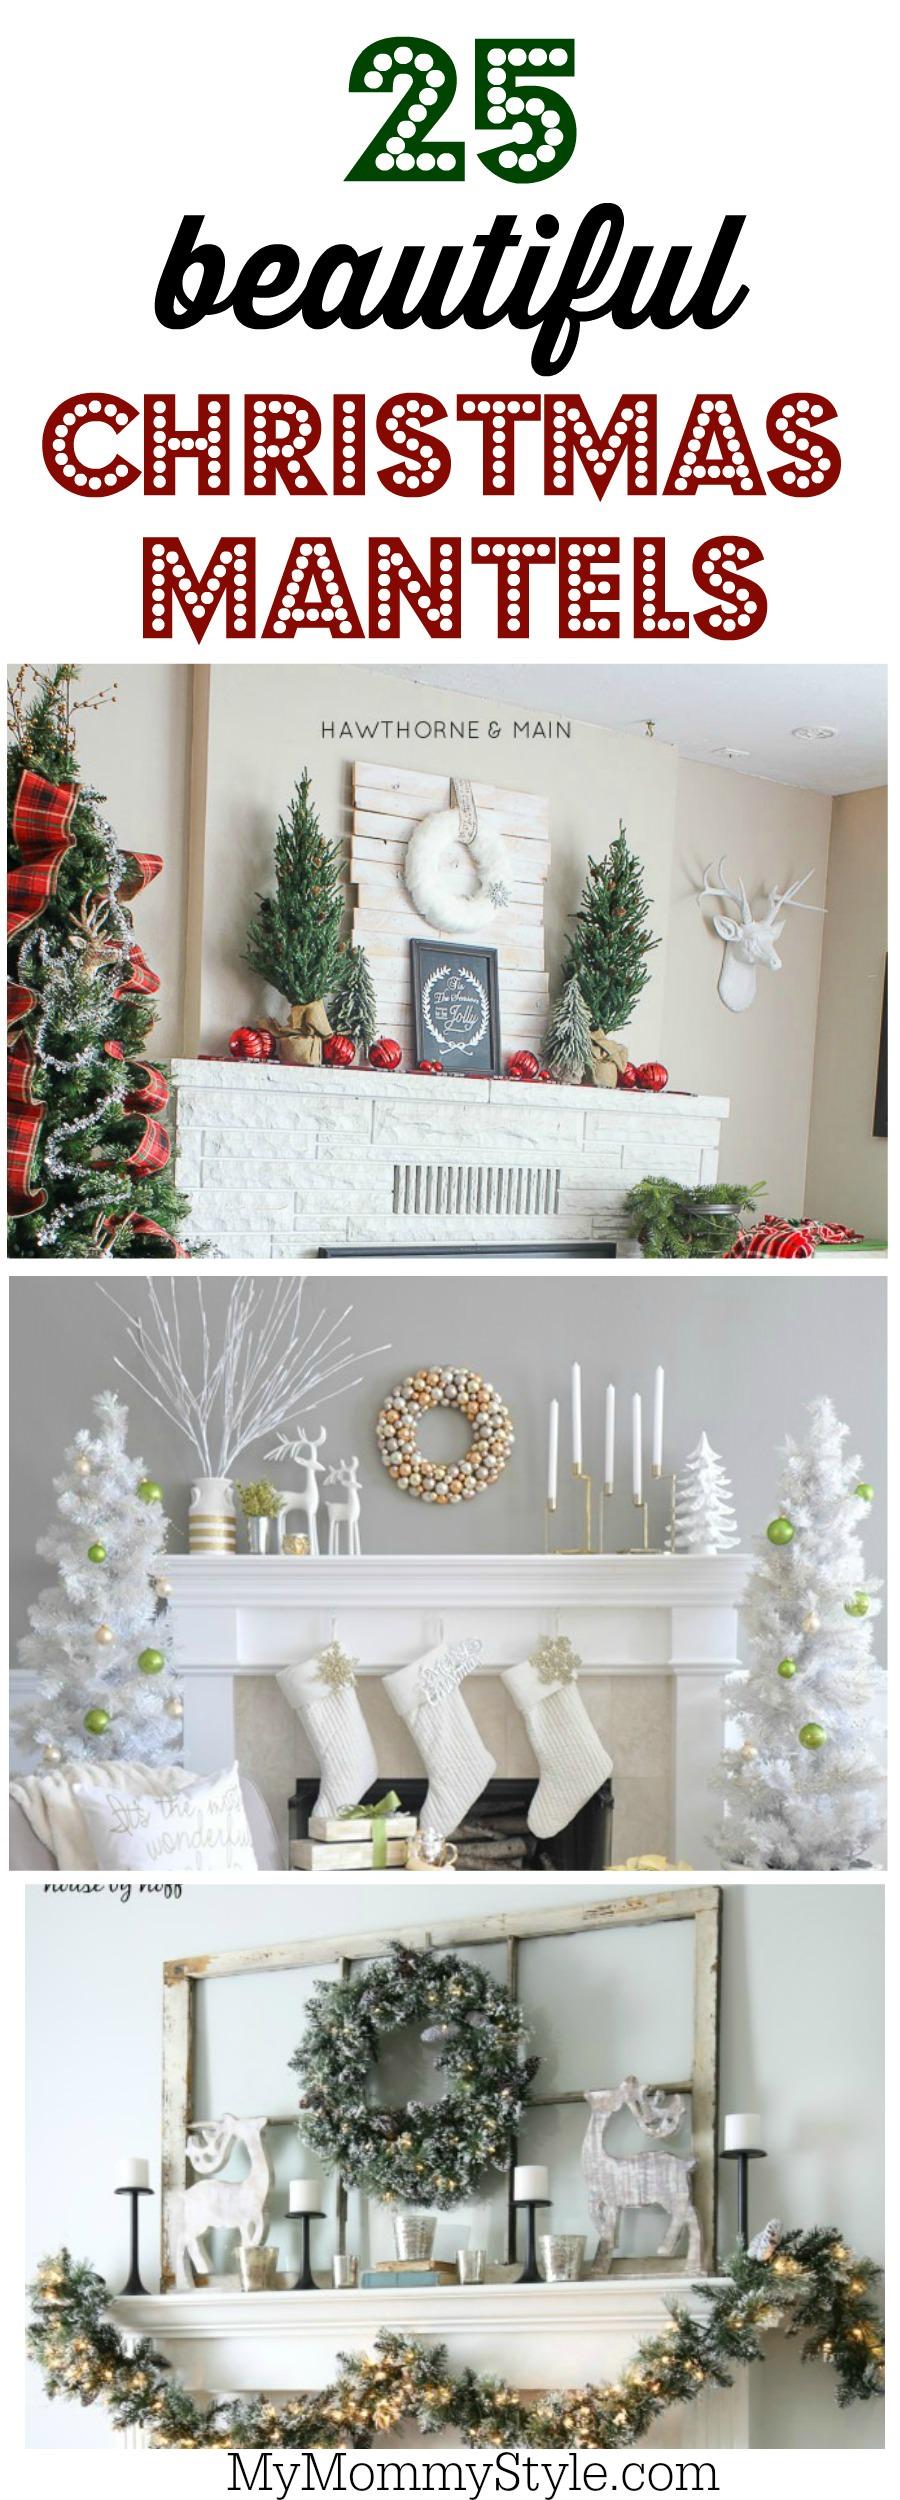 25 beautiful mantel decorating ideas - Beautiful Christmas Mantel Decorations